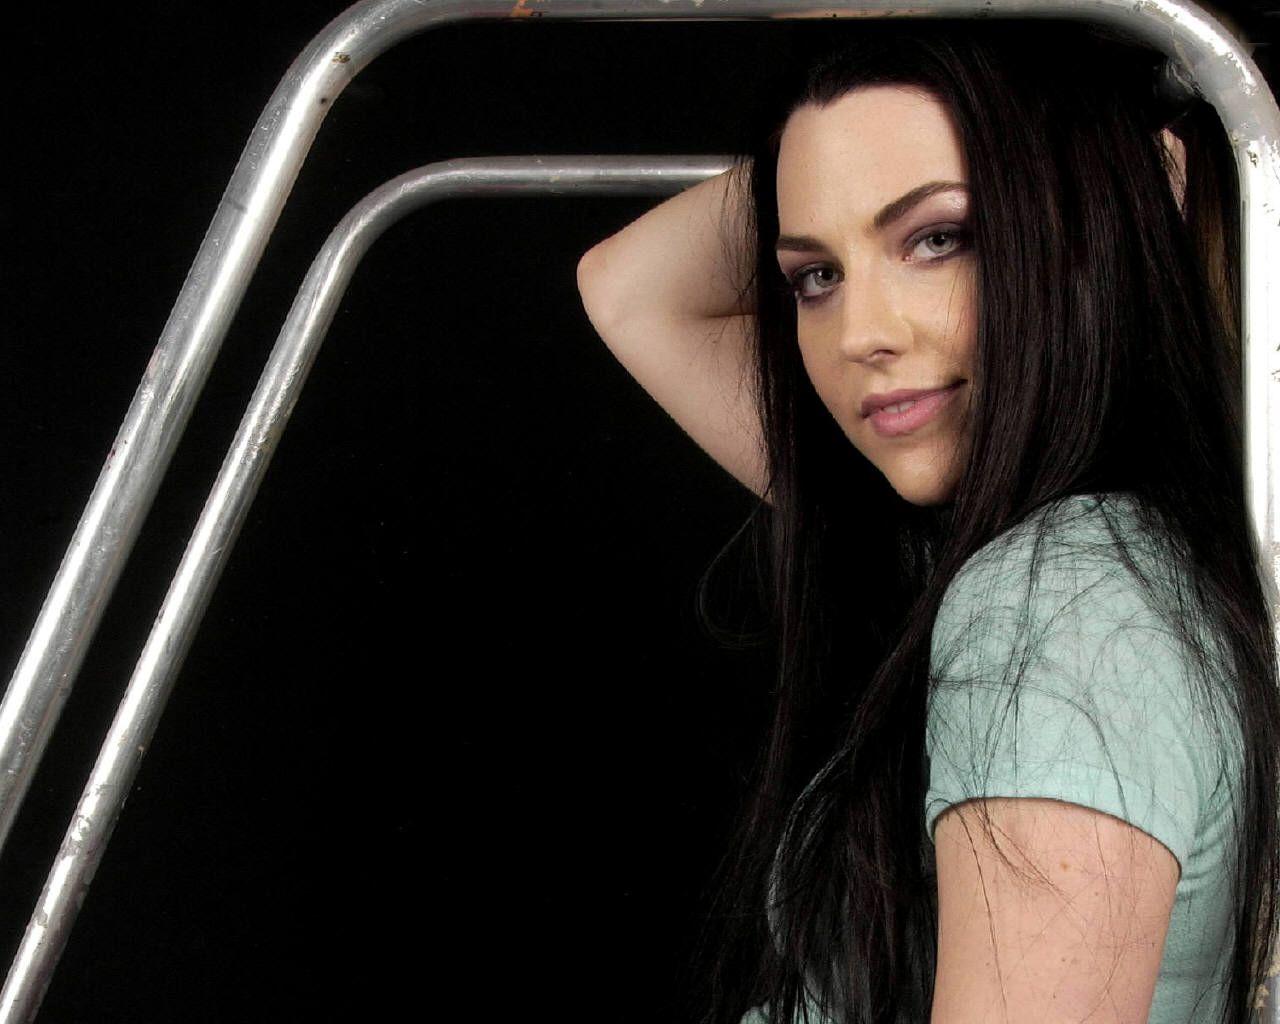 Evanescence Wallpaper Amy Lee Amy Lee Amy Lee Evanescence Amy Amy lee singer hd wallpapers